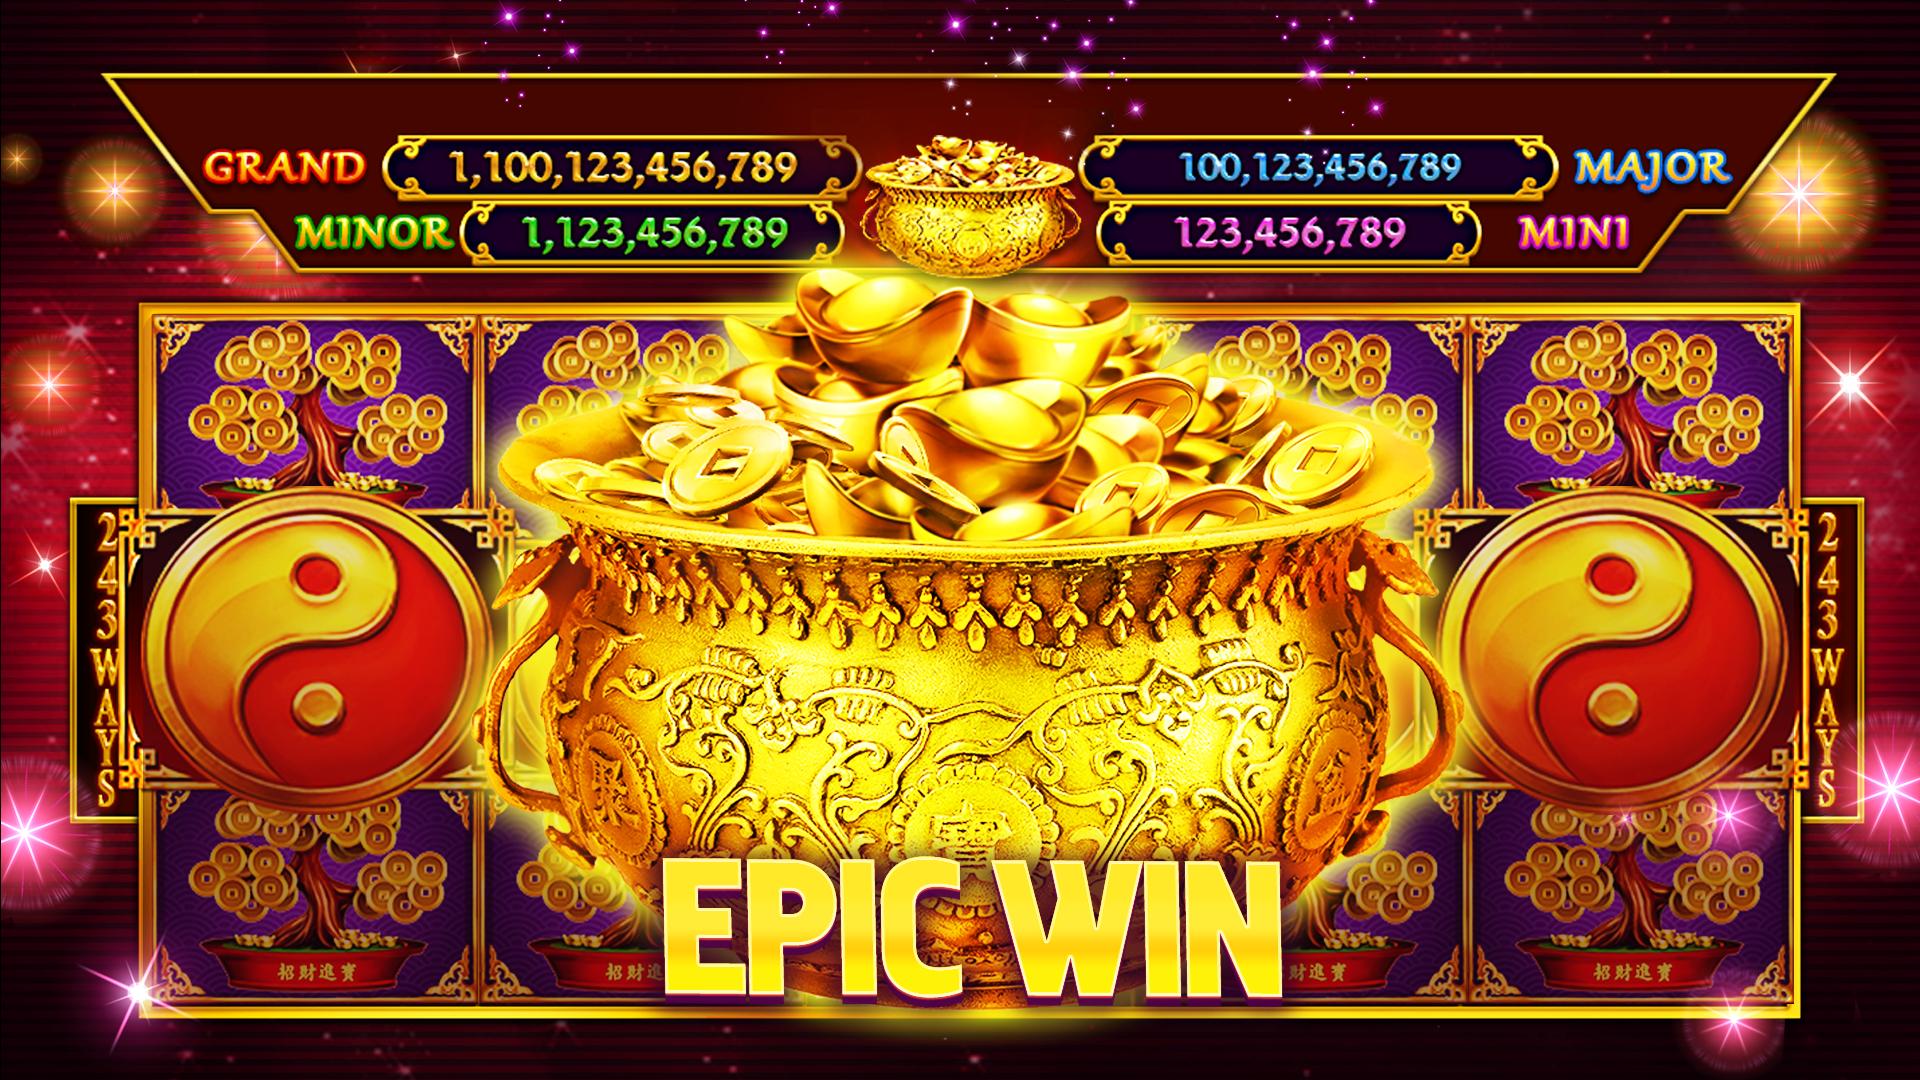 Epic slot สมัครวันนี้รับโบนัต้อนรับทันที โบนัส 50% เกม spin